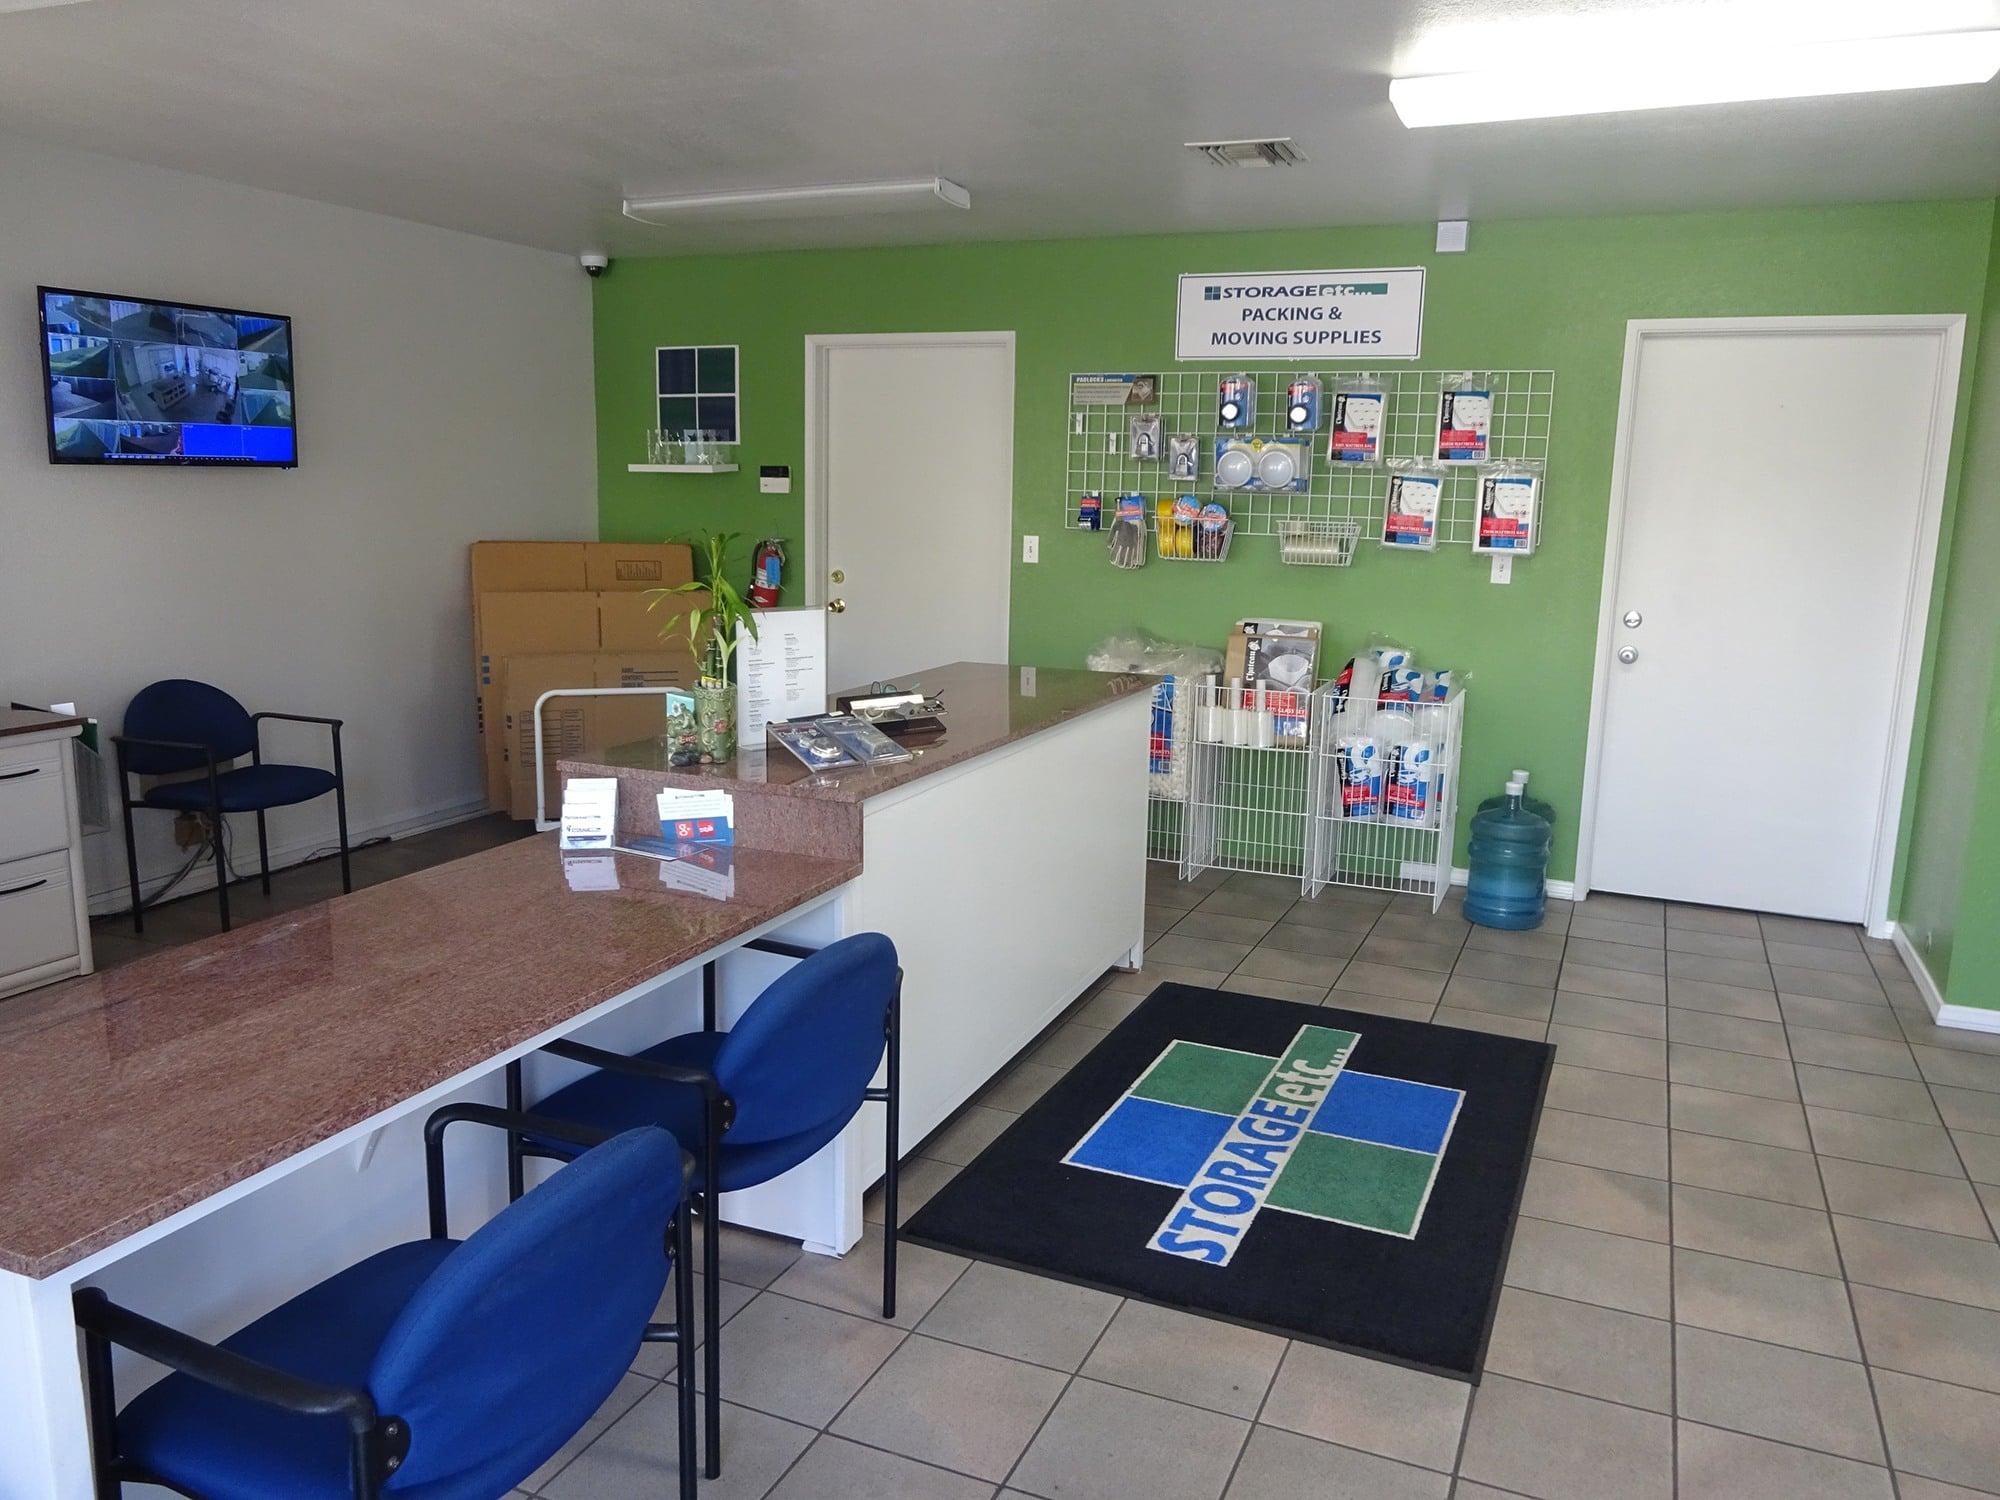 Self Storage Rental Office at Storage Etc... Pomona